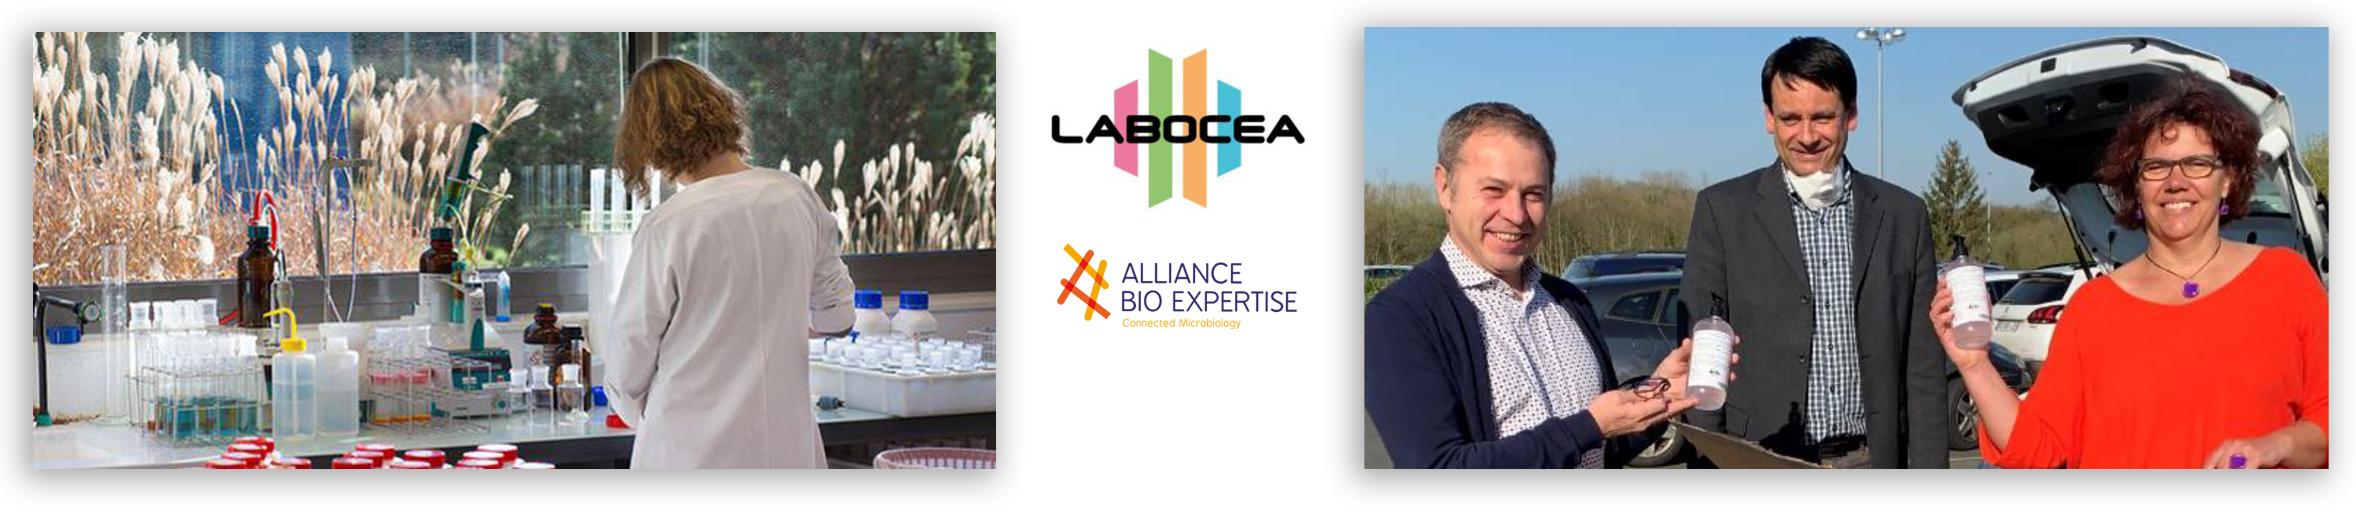 labocea alliance bio expertise